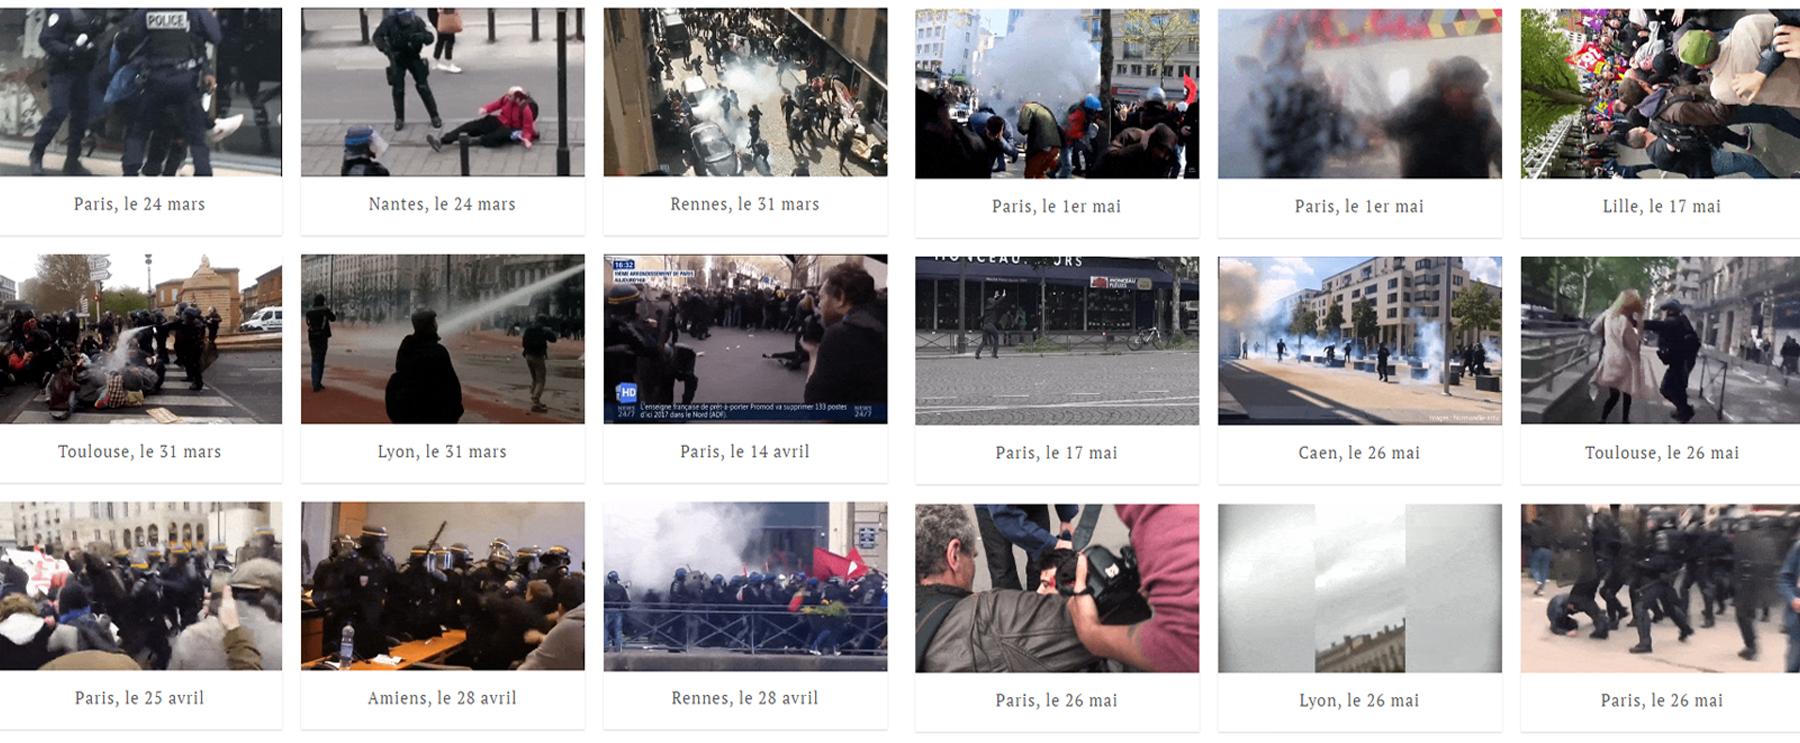 mediapart police violence france 2016